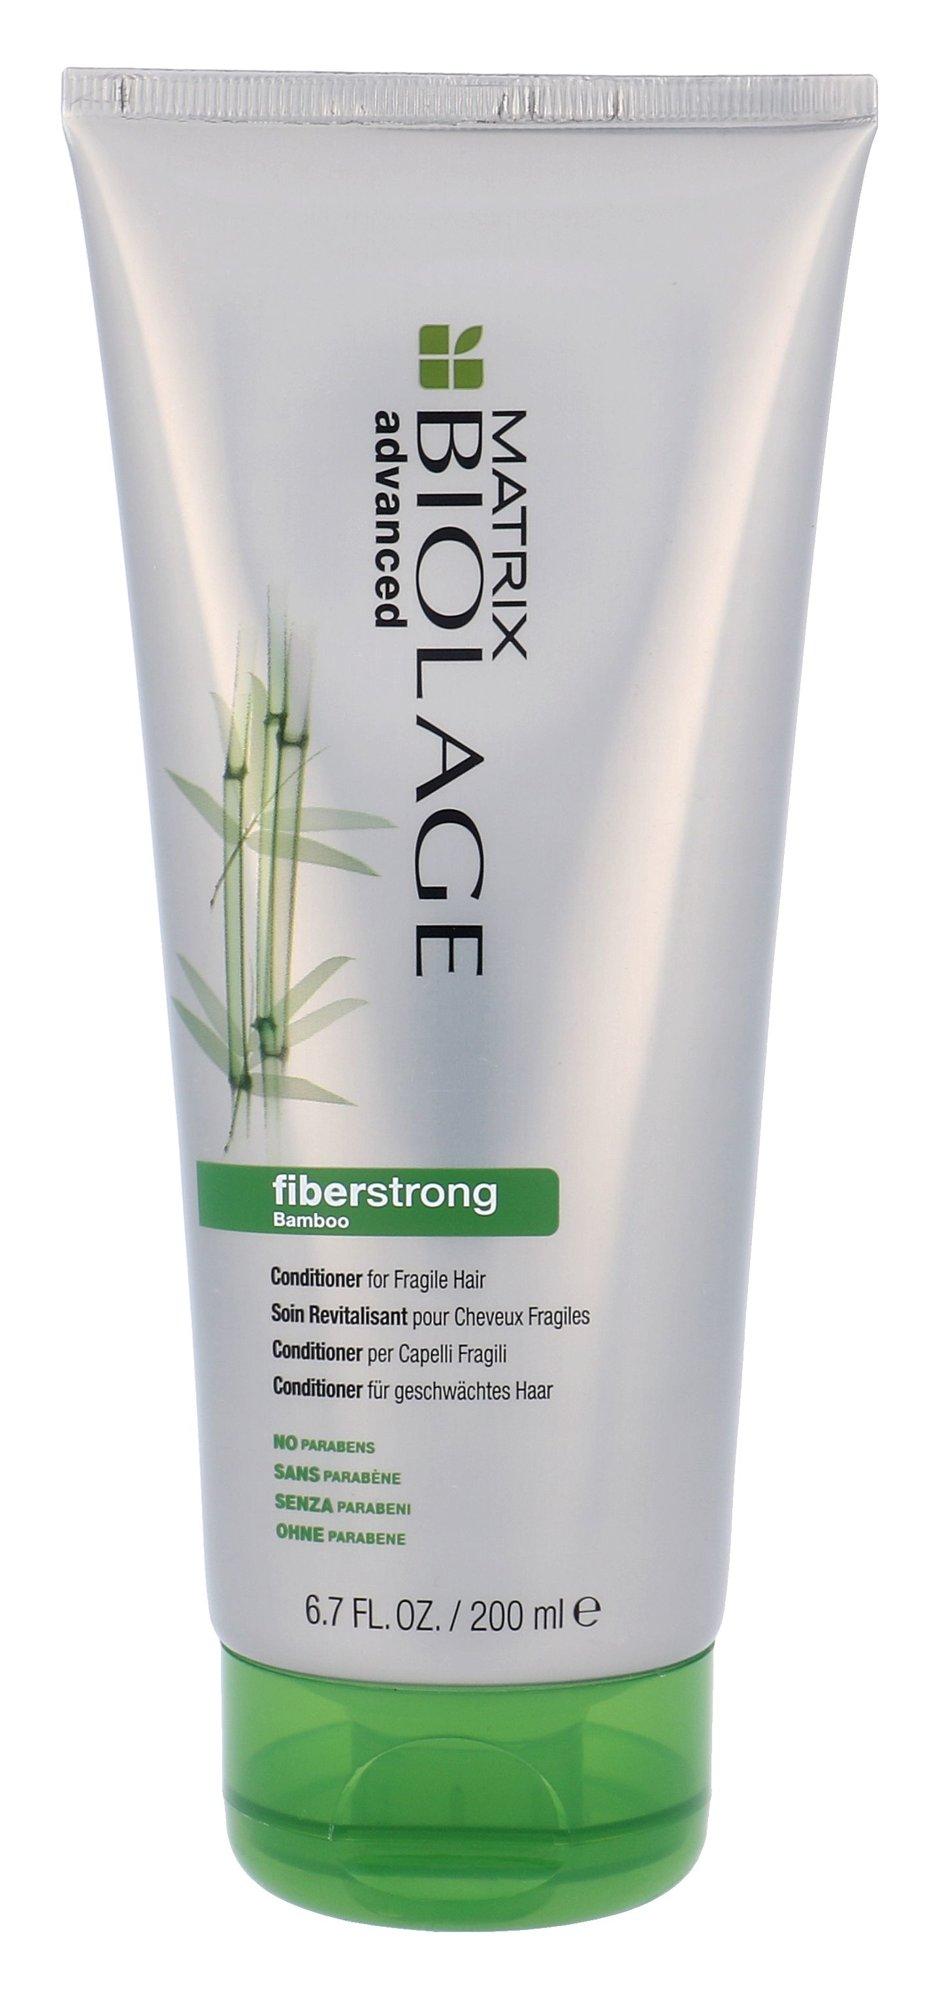 Plaukų kondicionierius Matrix Biolage Bamboo Fiberstrong